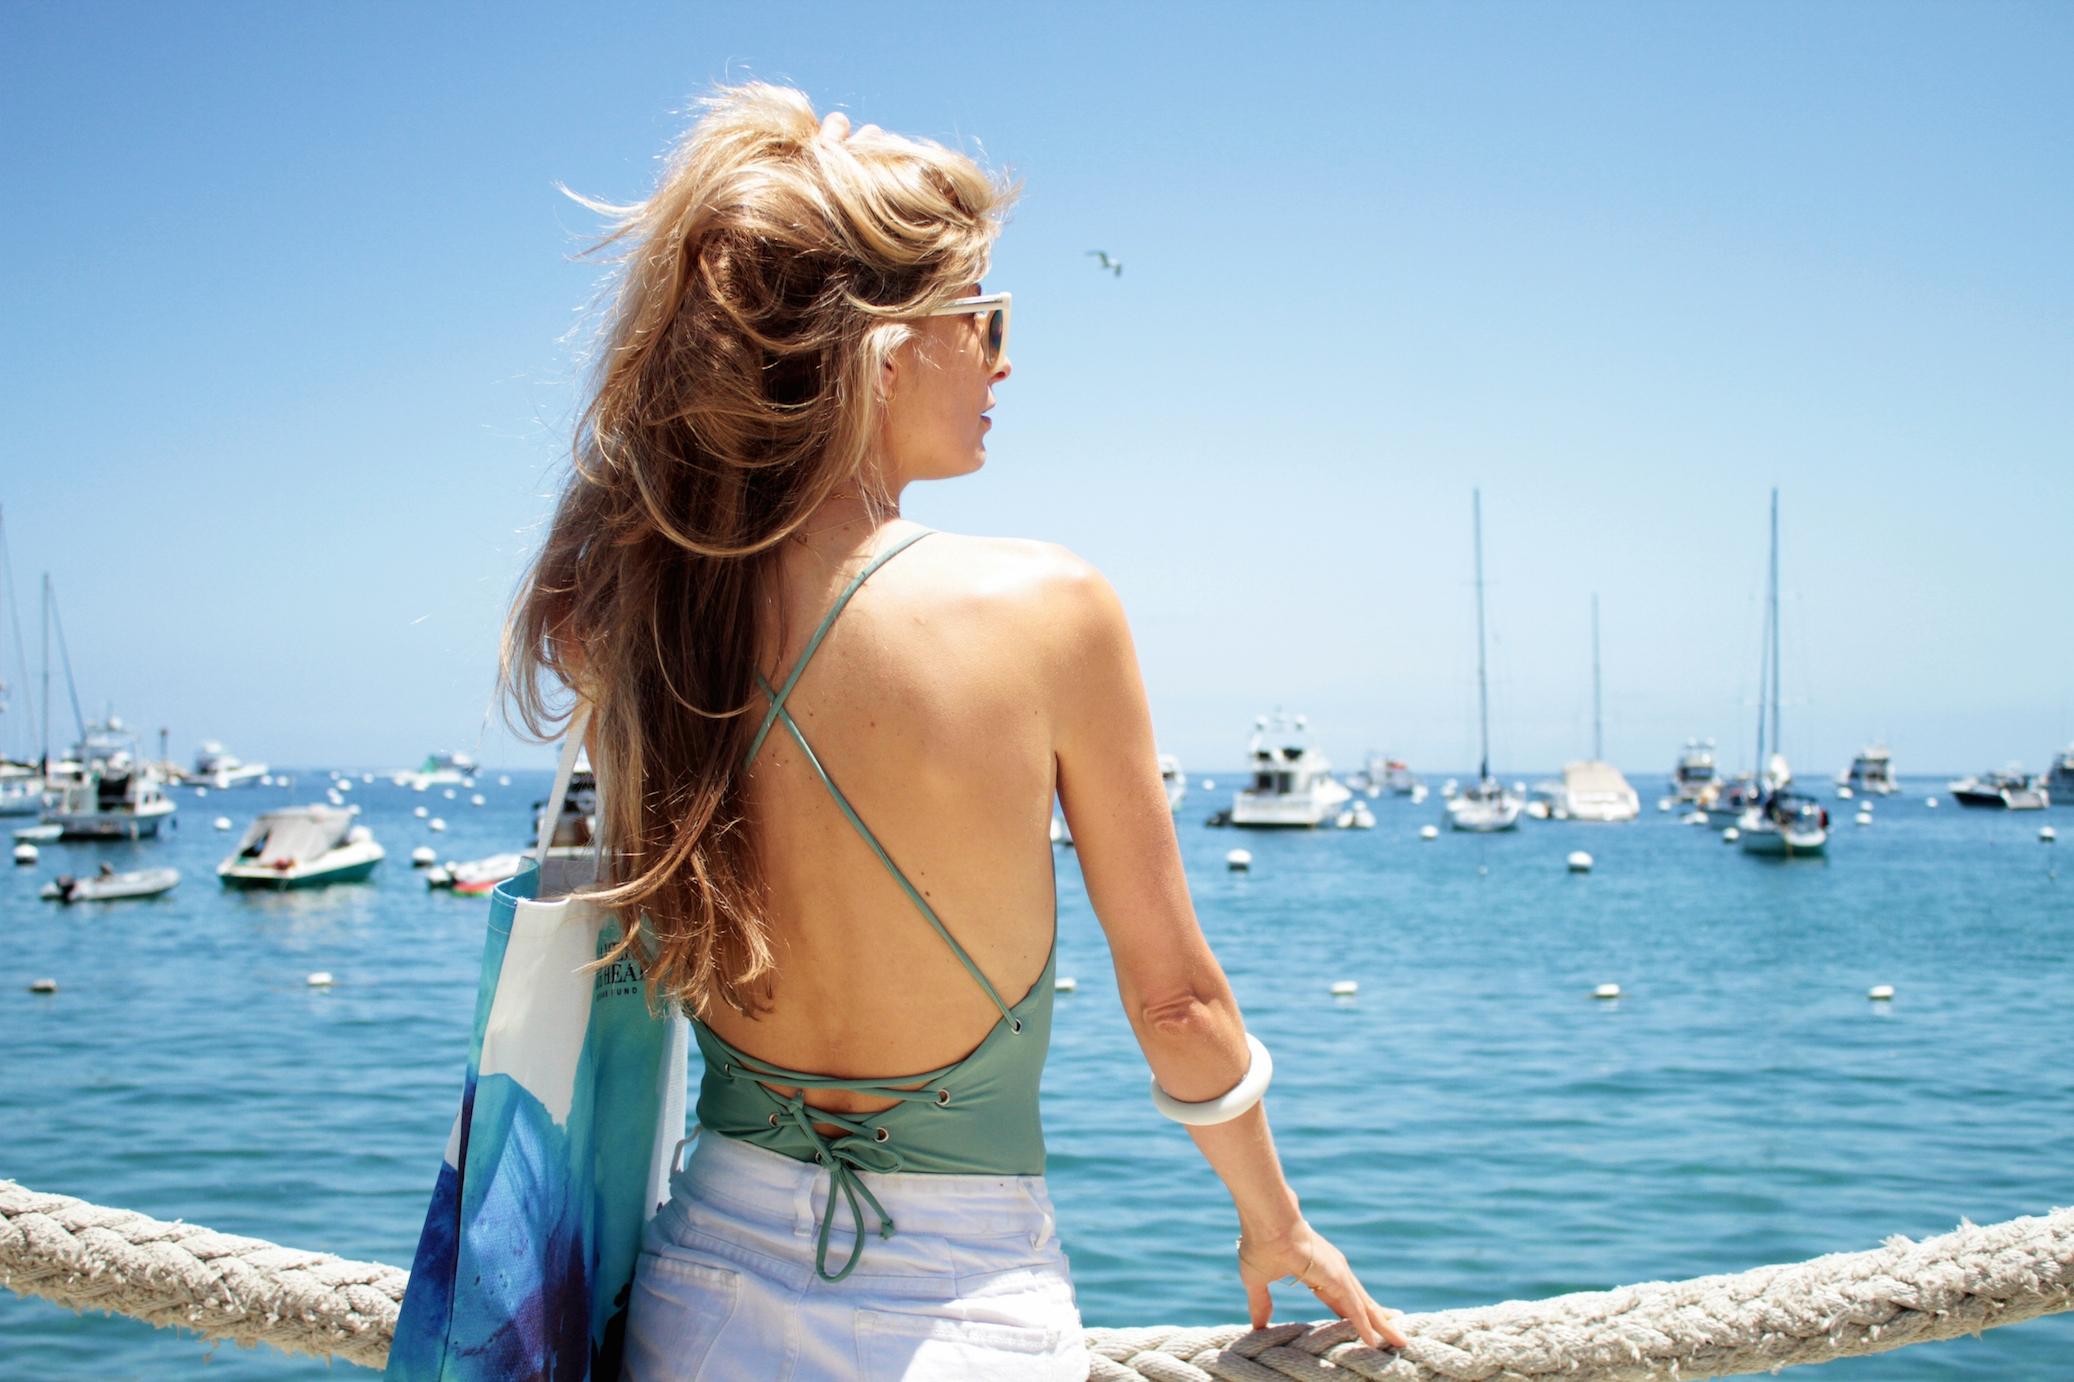 Tobi Swimsuit $50 &  La Mer Ocean's Fund Special Edition Tote